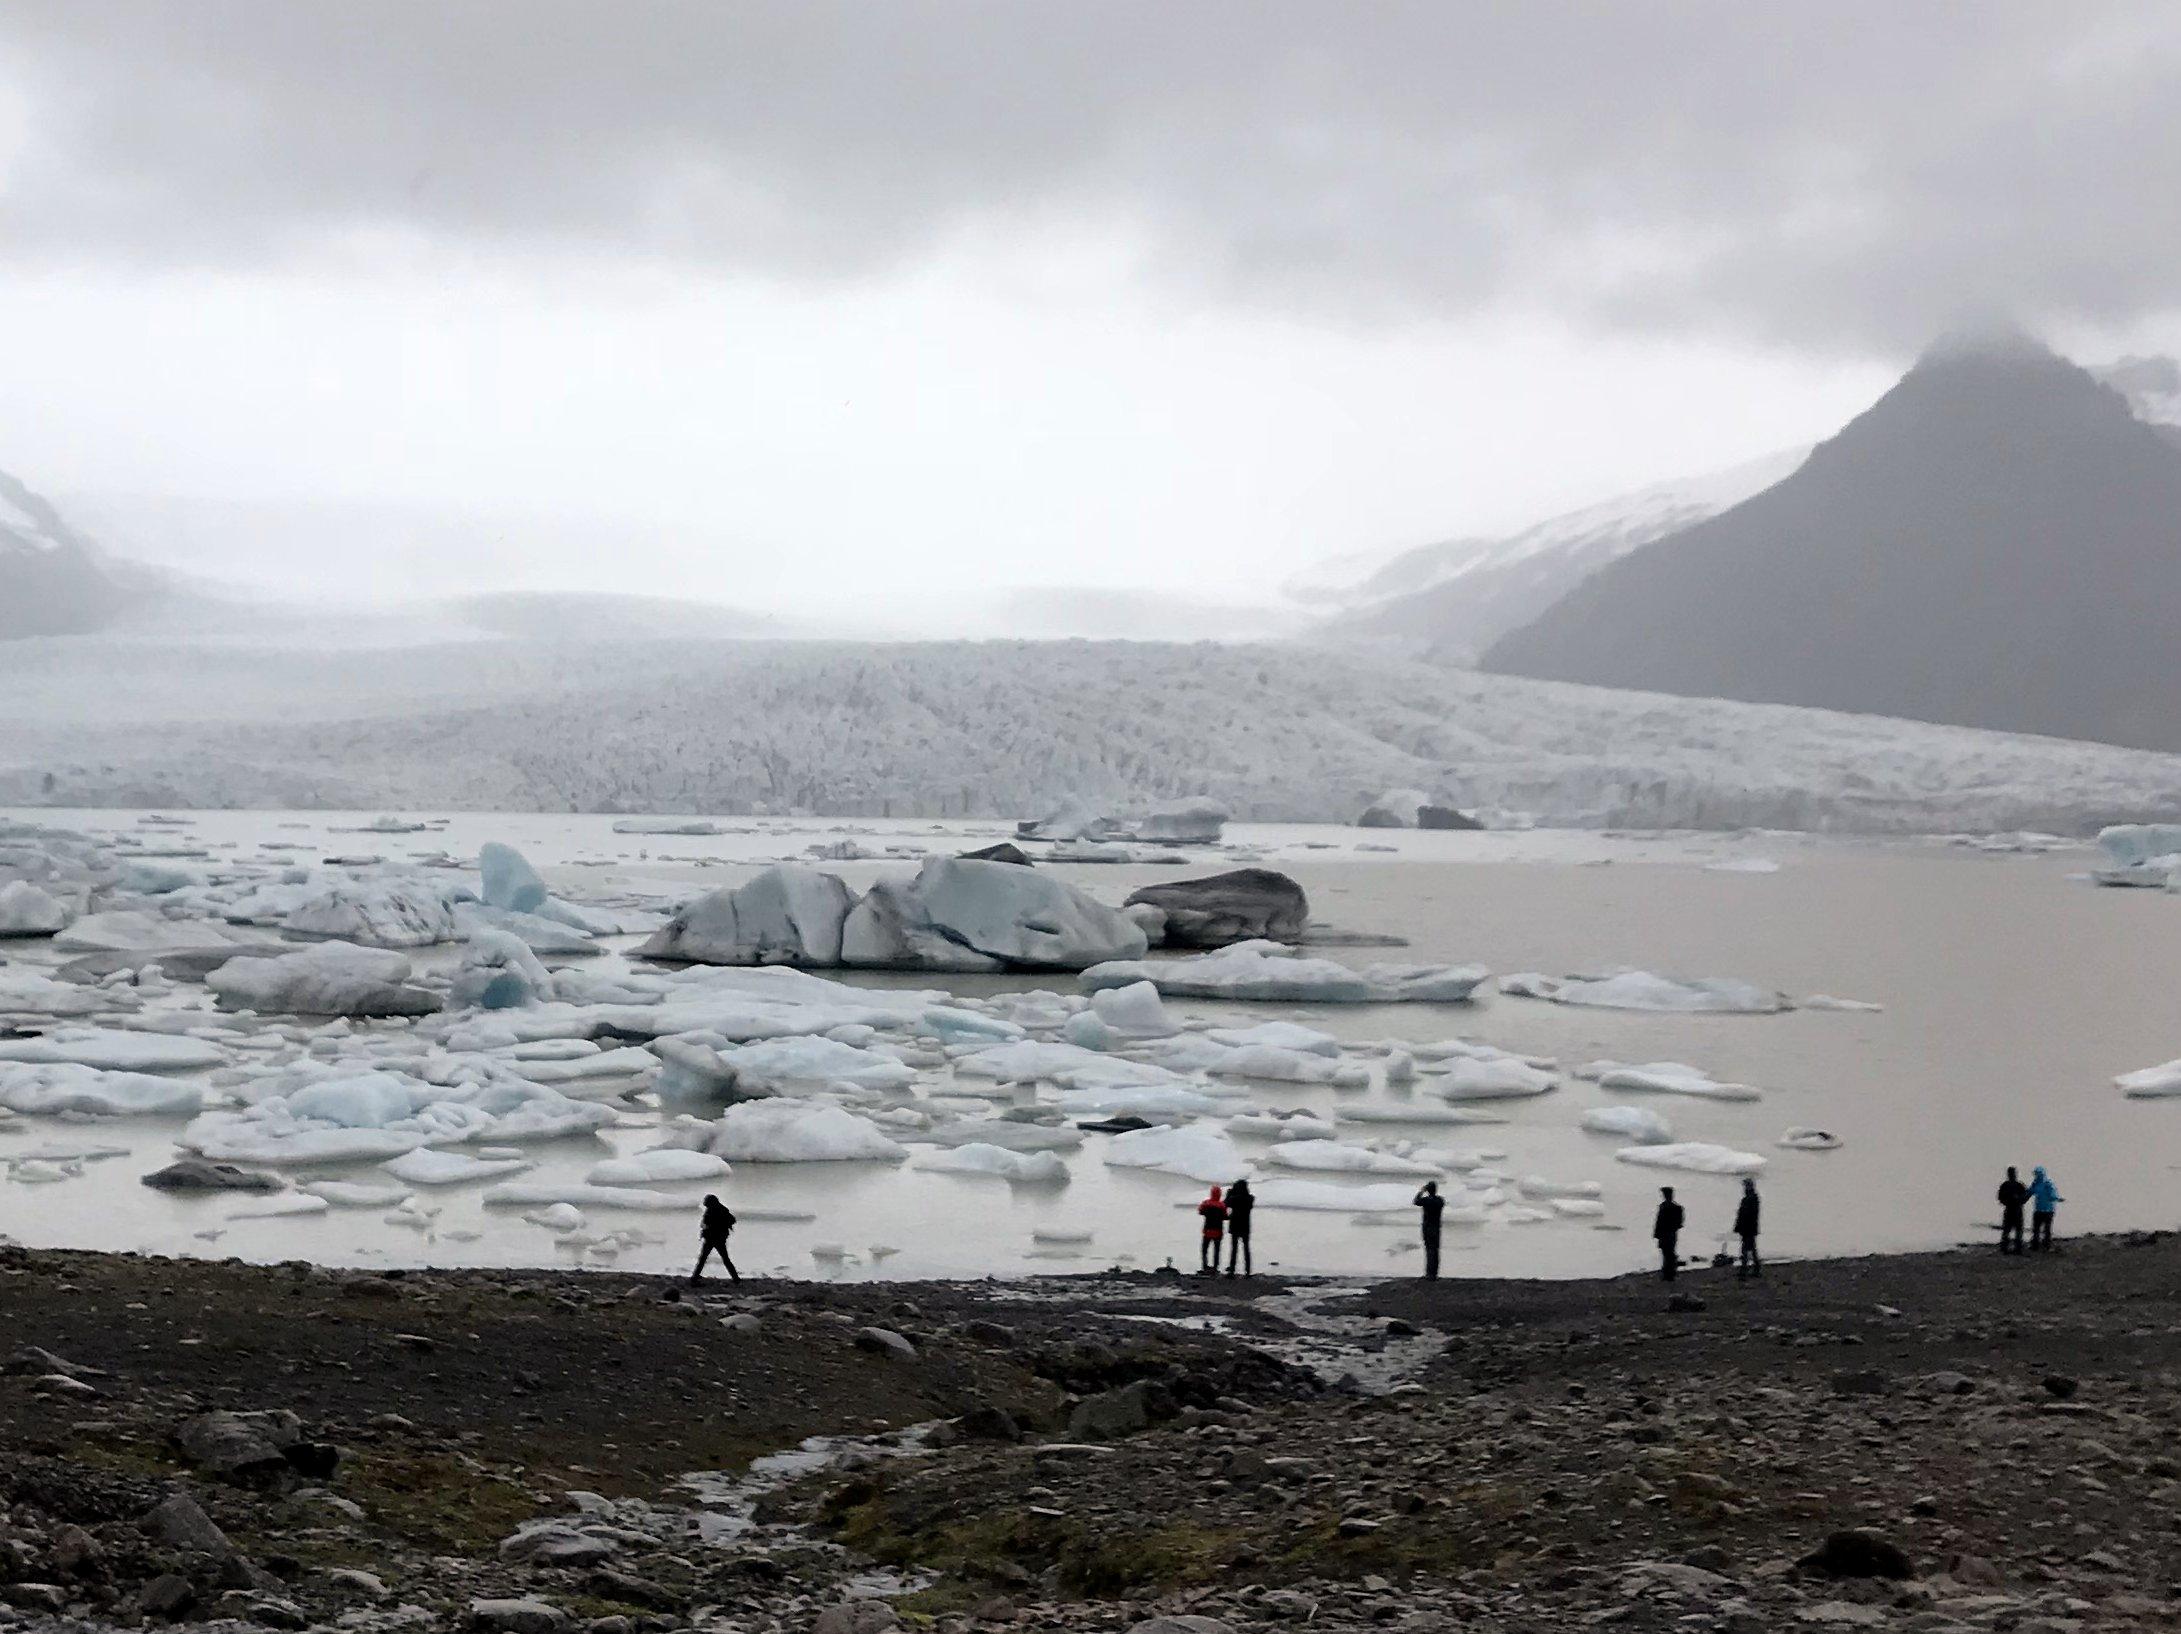 Fjallsárlón Glacier Lagoon with Vatnajökull Glacier behind it